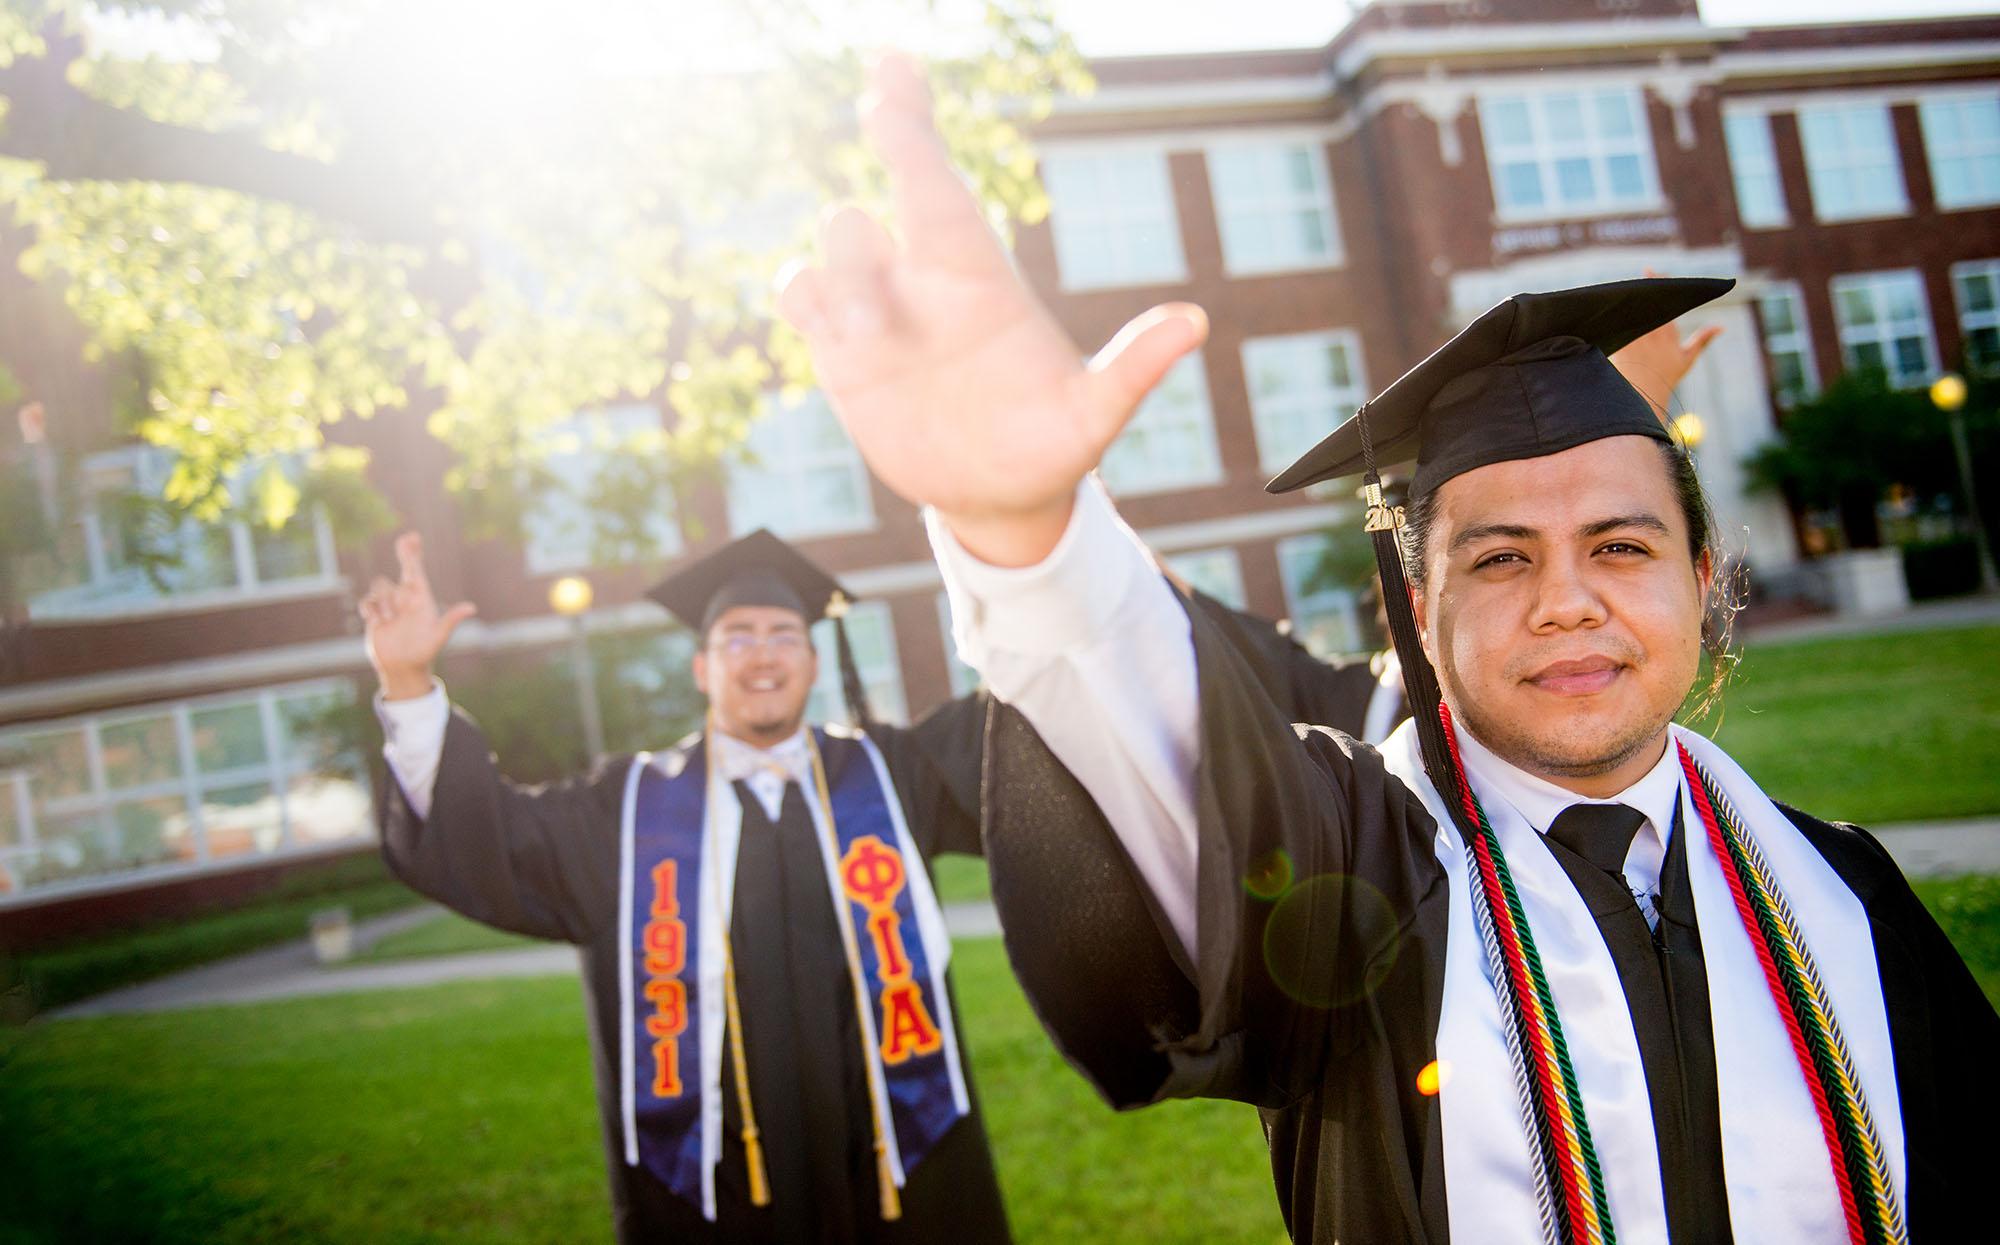 16479-HSI graduates_DSC6591-1